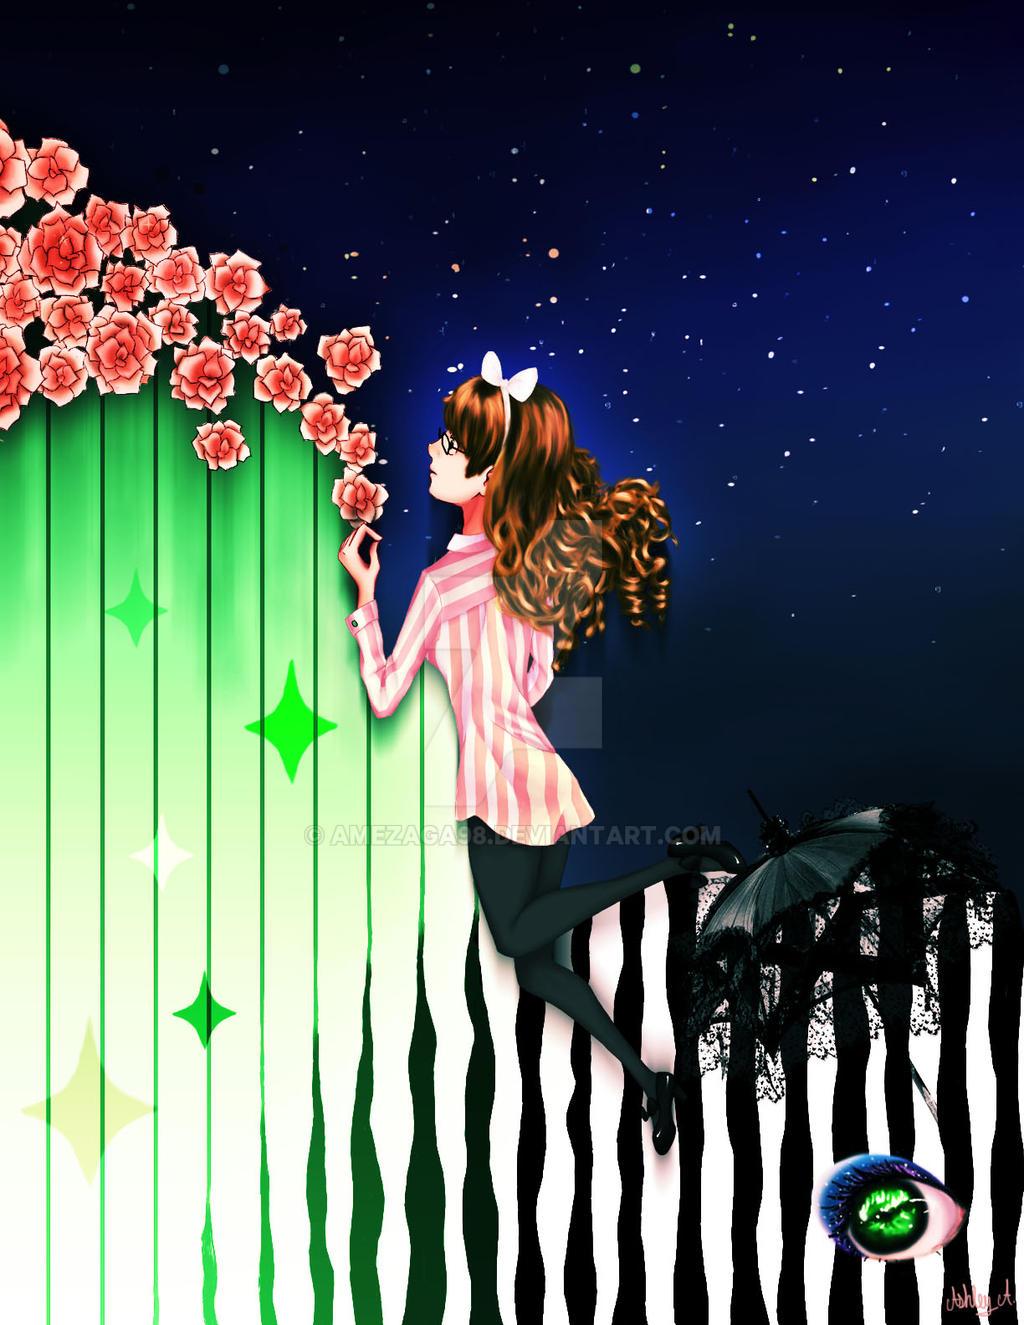 Ashley's Imagination by amezaga98